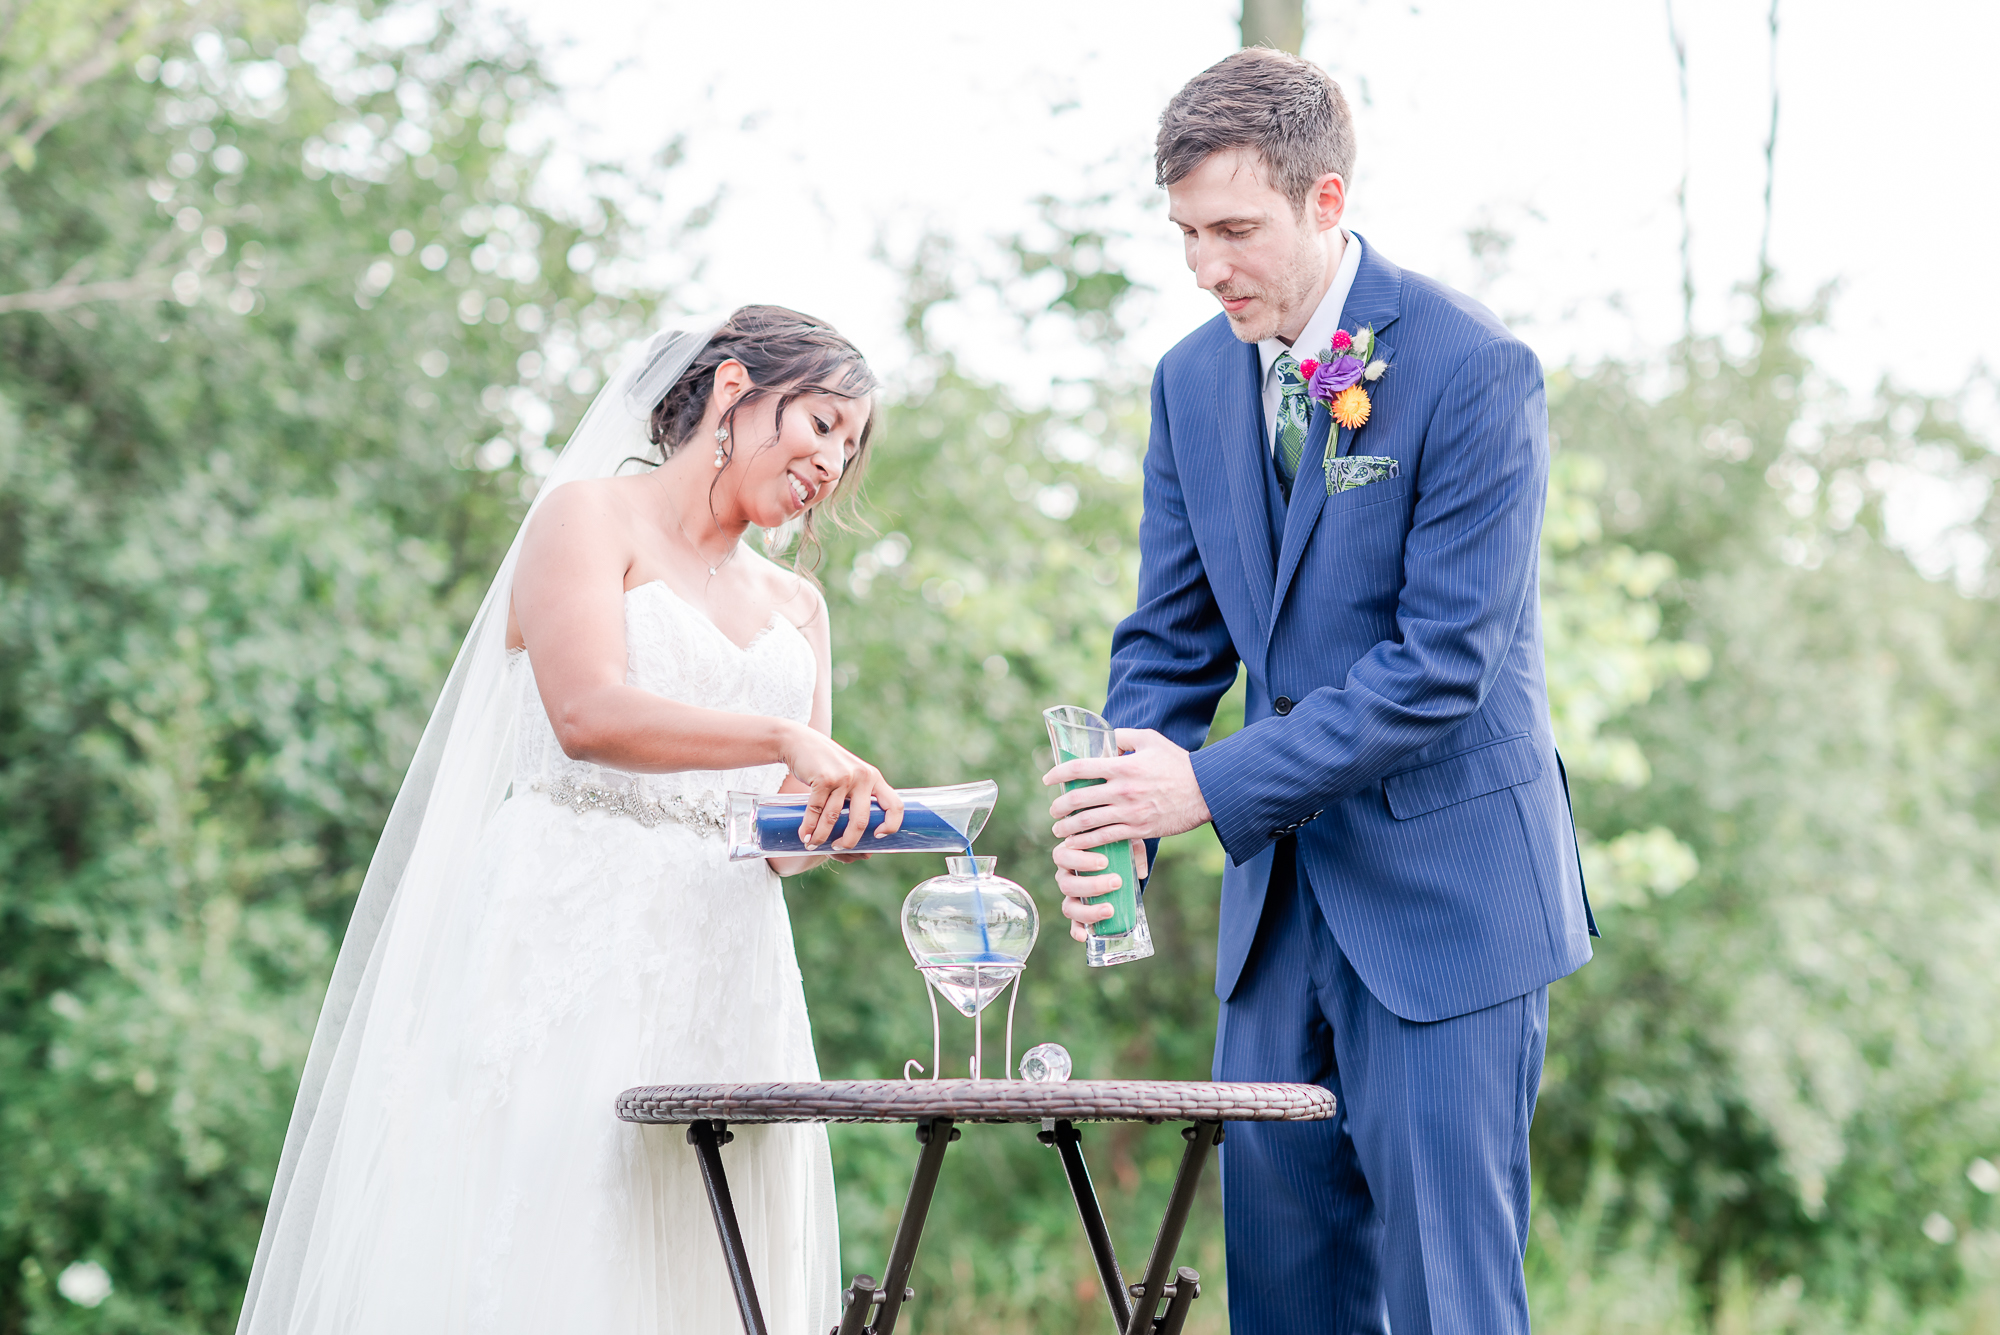 Maria+Adam_Summer Barn Wedding_The Barn at The North Star Preserve_Oberlin_Ohio-172.jpg